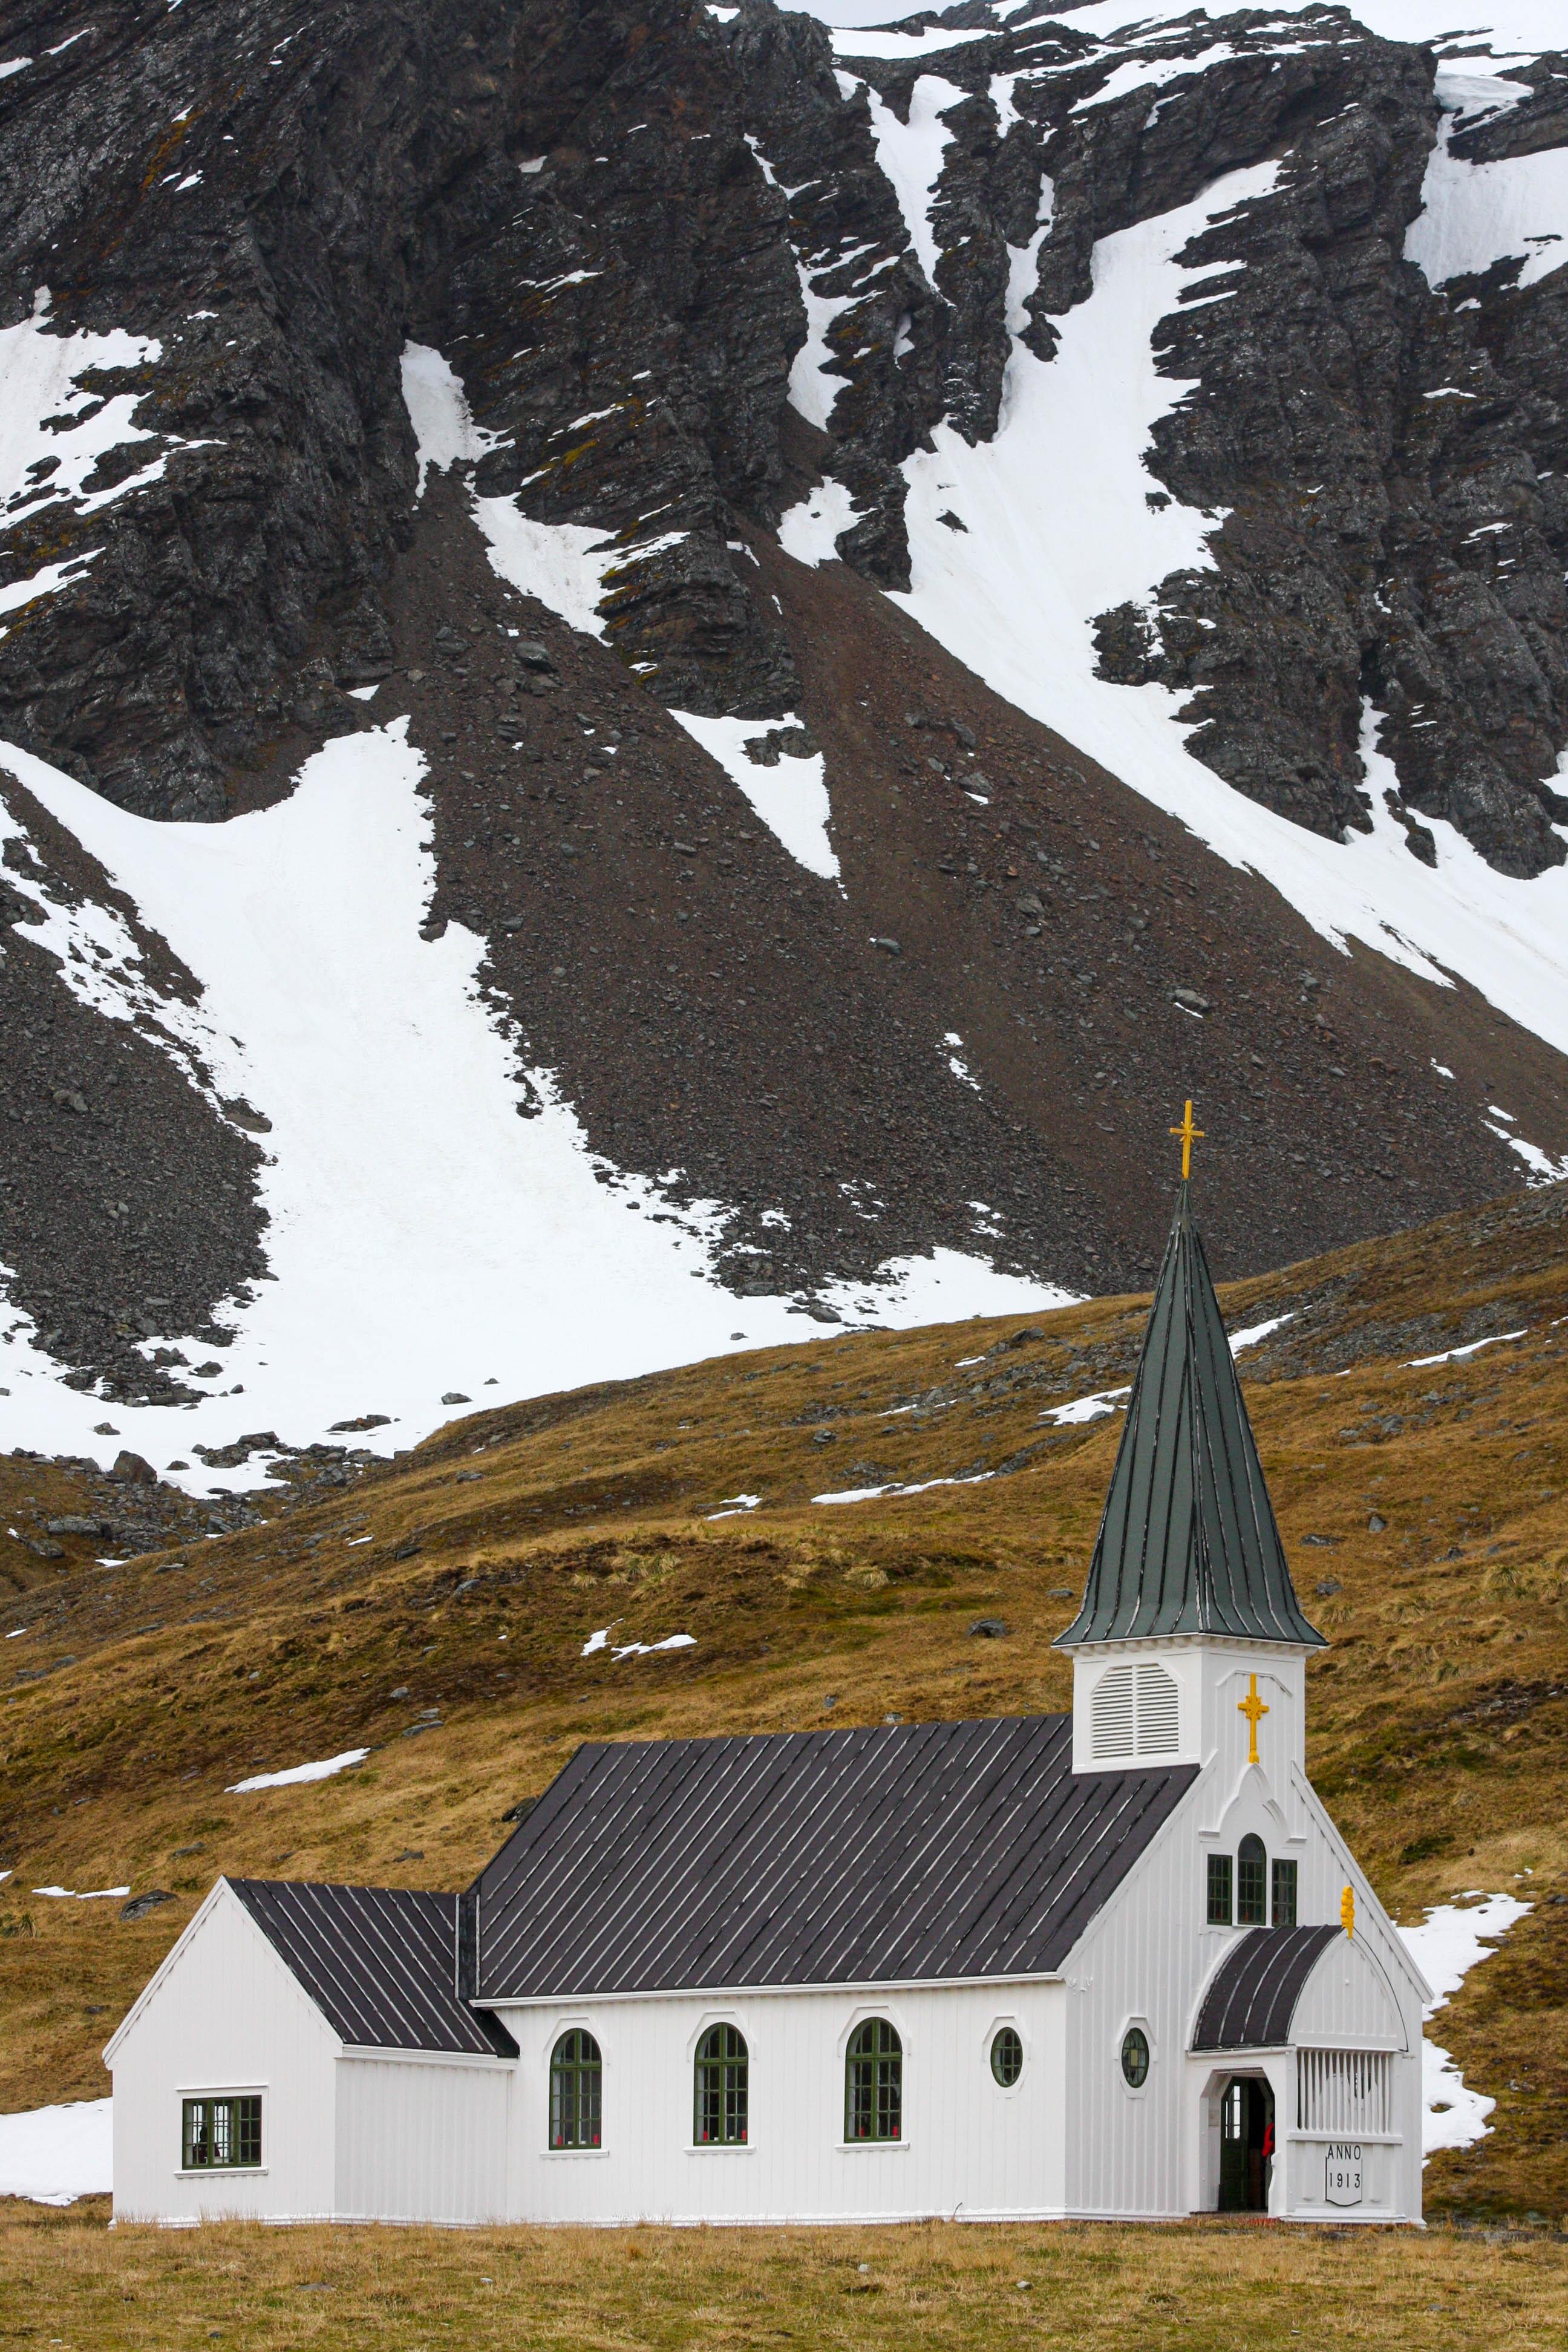 Norwegian Lutheran Church (Whaler's Church), Grytviken, South Georgia